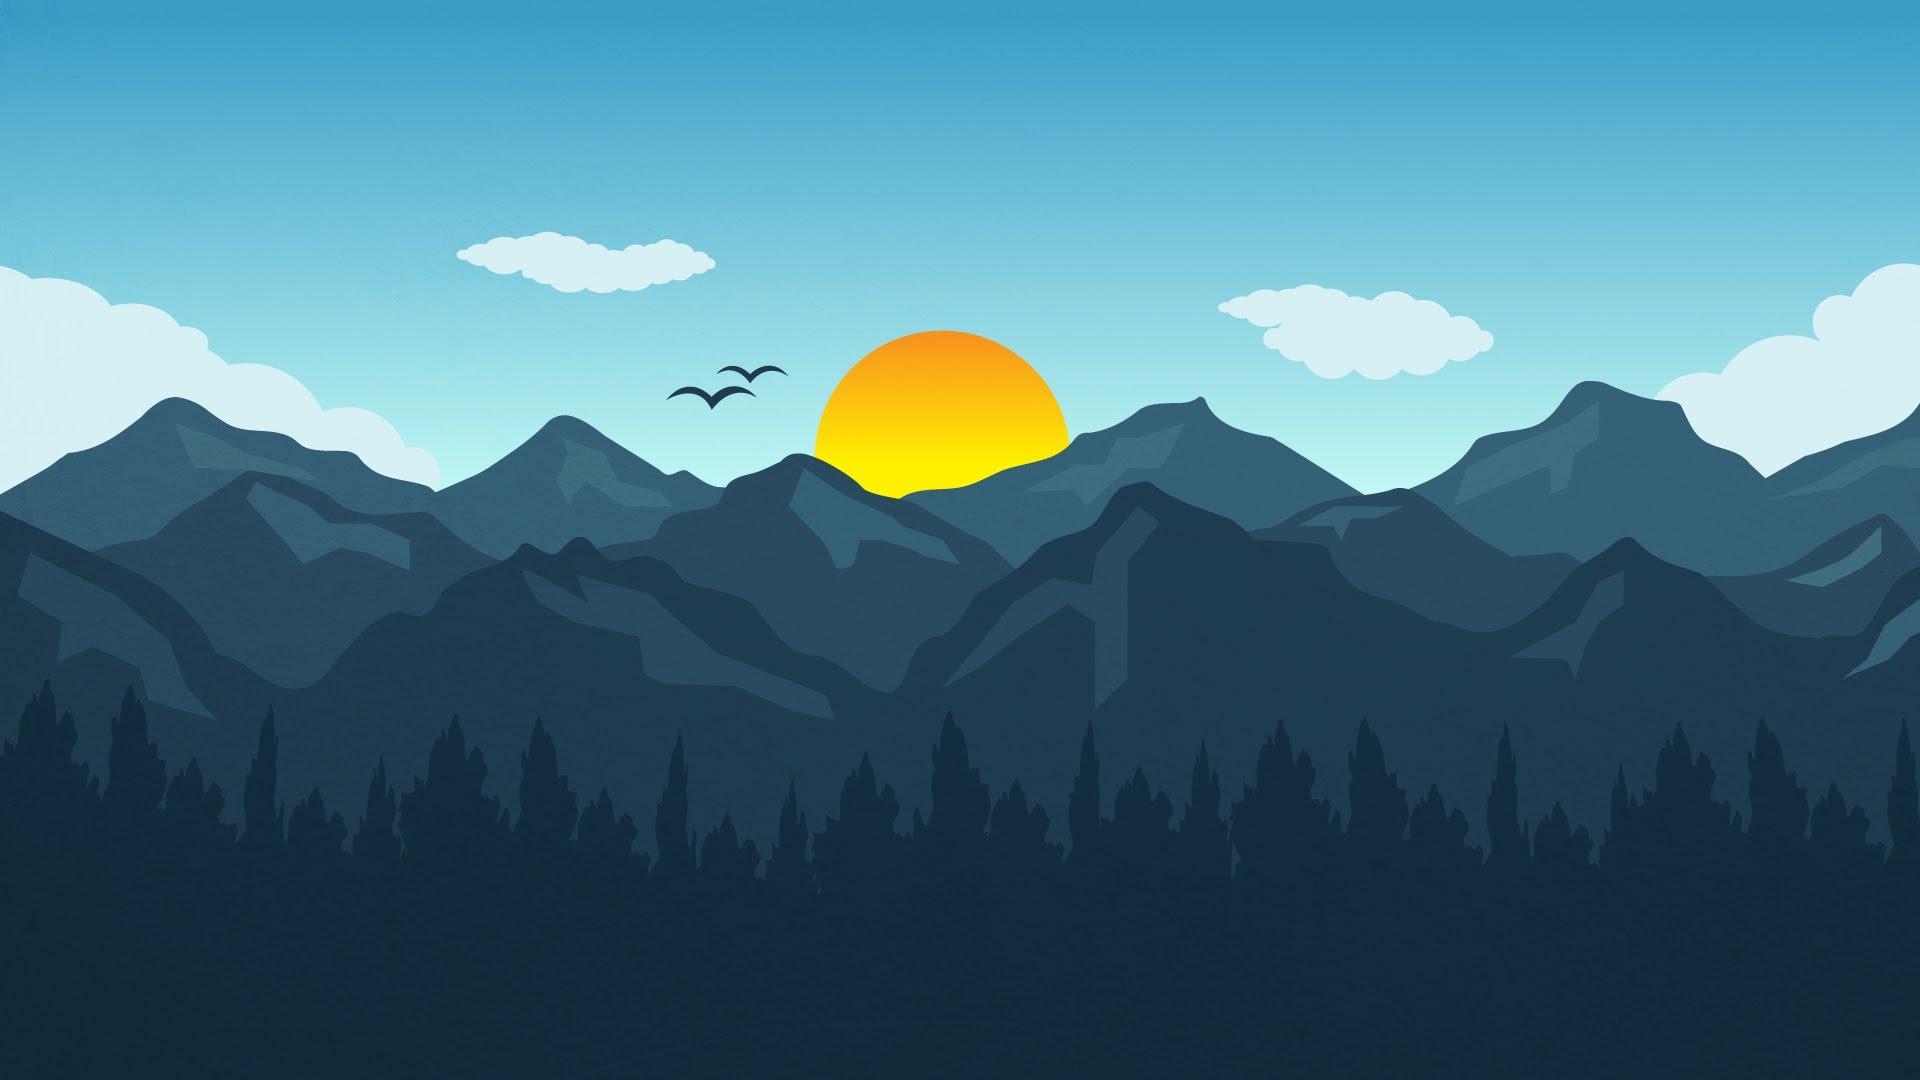 Drawn mountain adobe illustrator CC design Tutorial to landscape